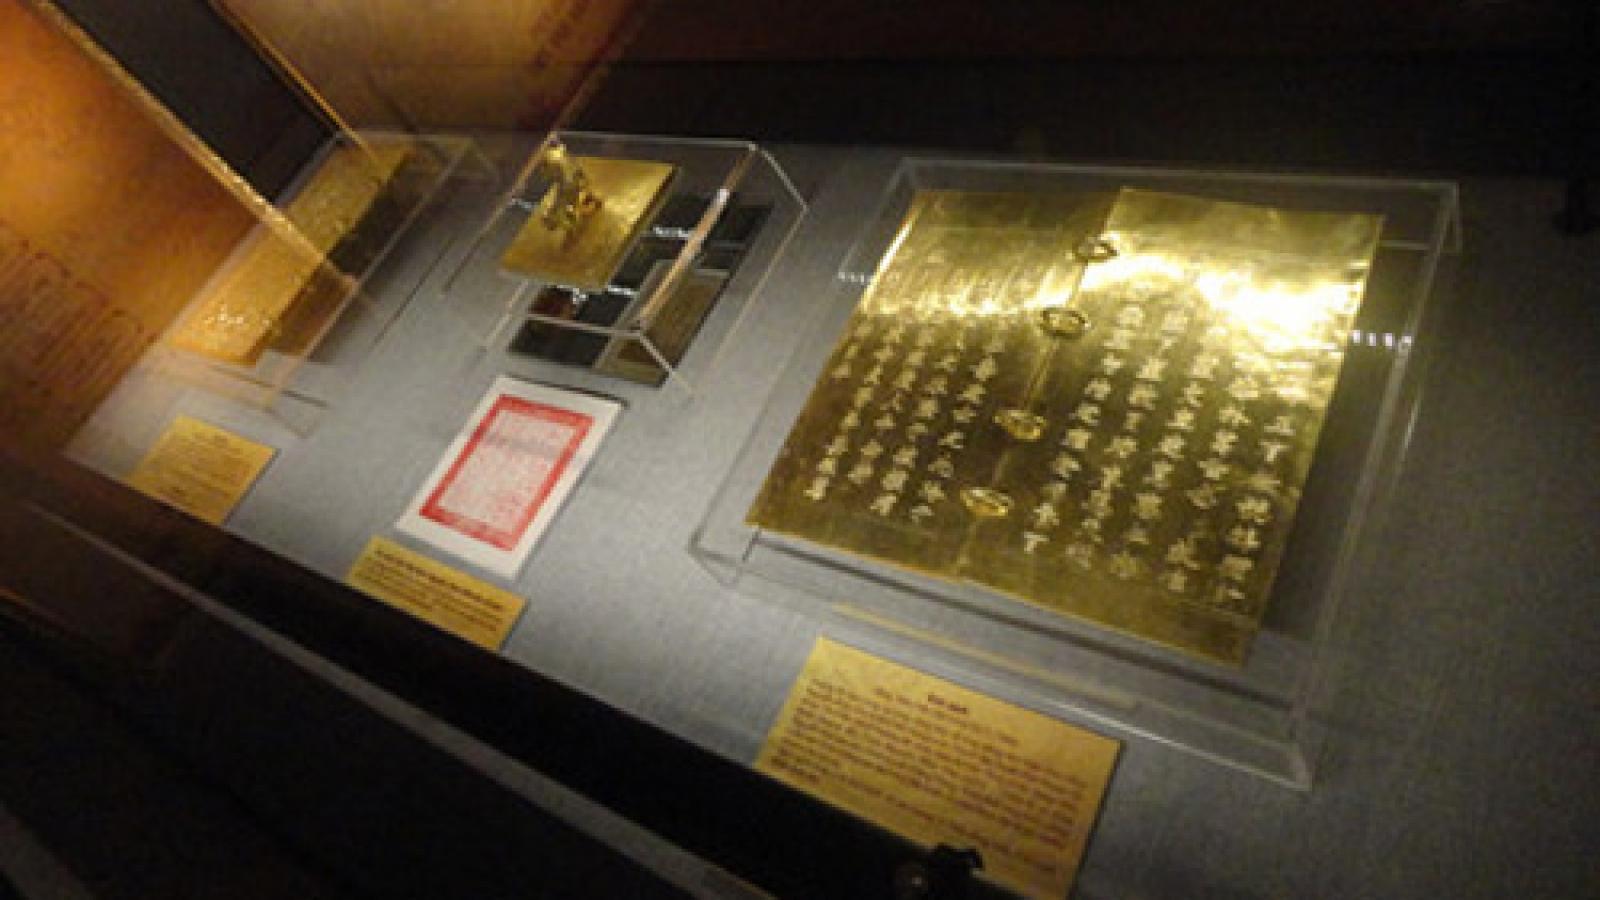 Golden books of Nguyen Dynasty – Vietnam's sacred imperial treasures